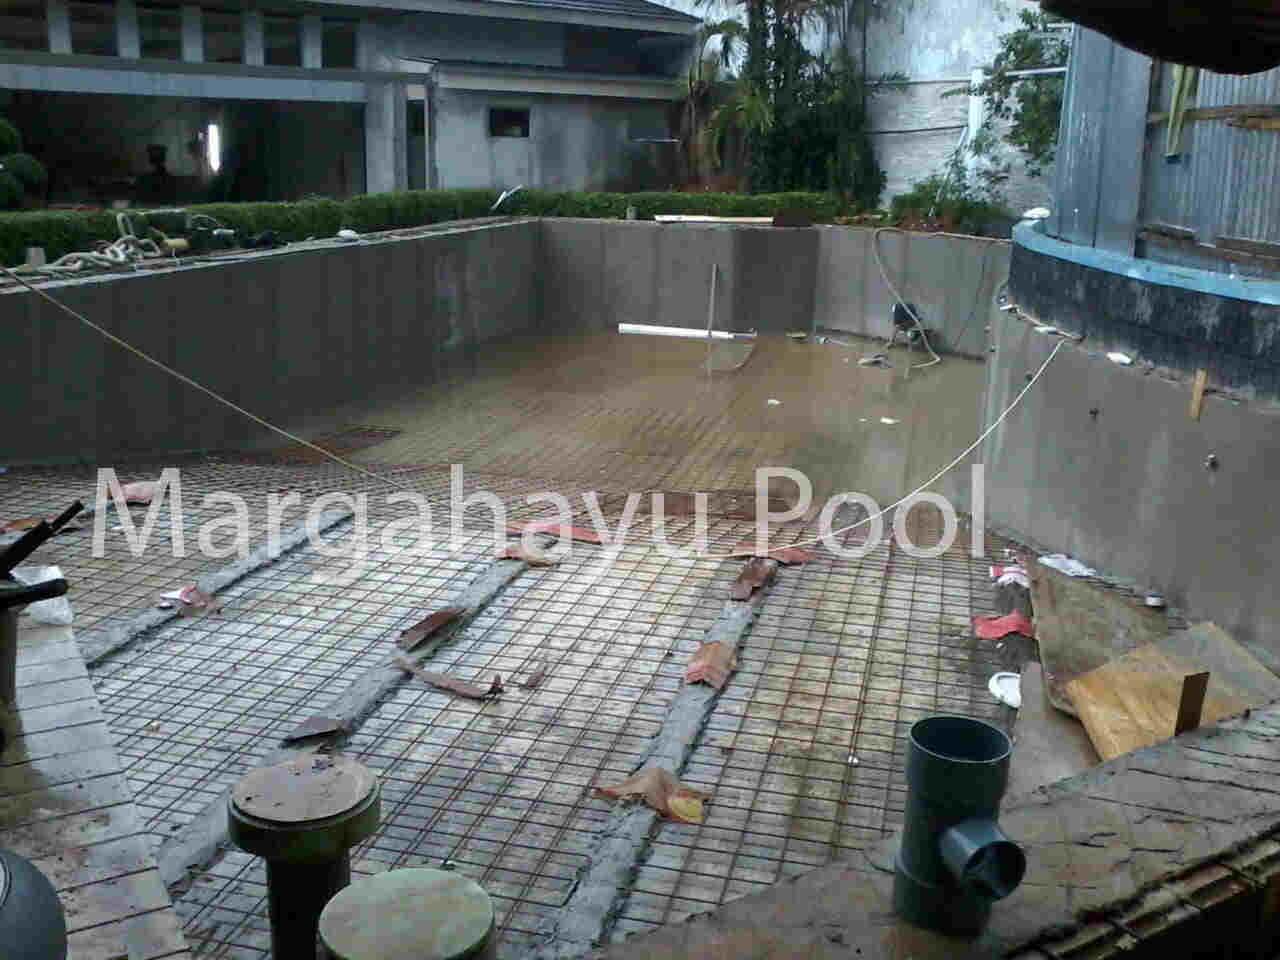 Margahayu pool-melayani jasa kontruksi kolam renang di kota cibaduyut-bandung